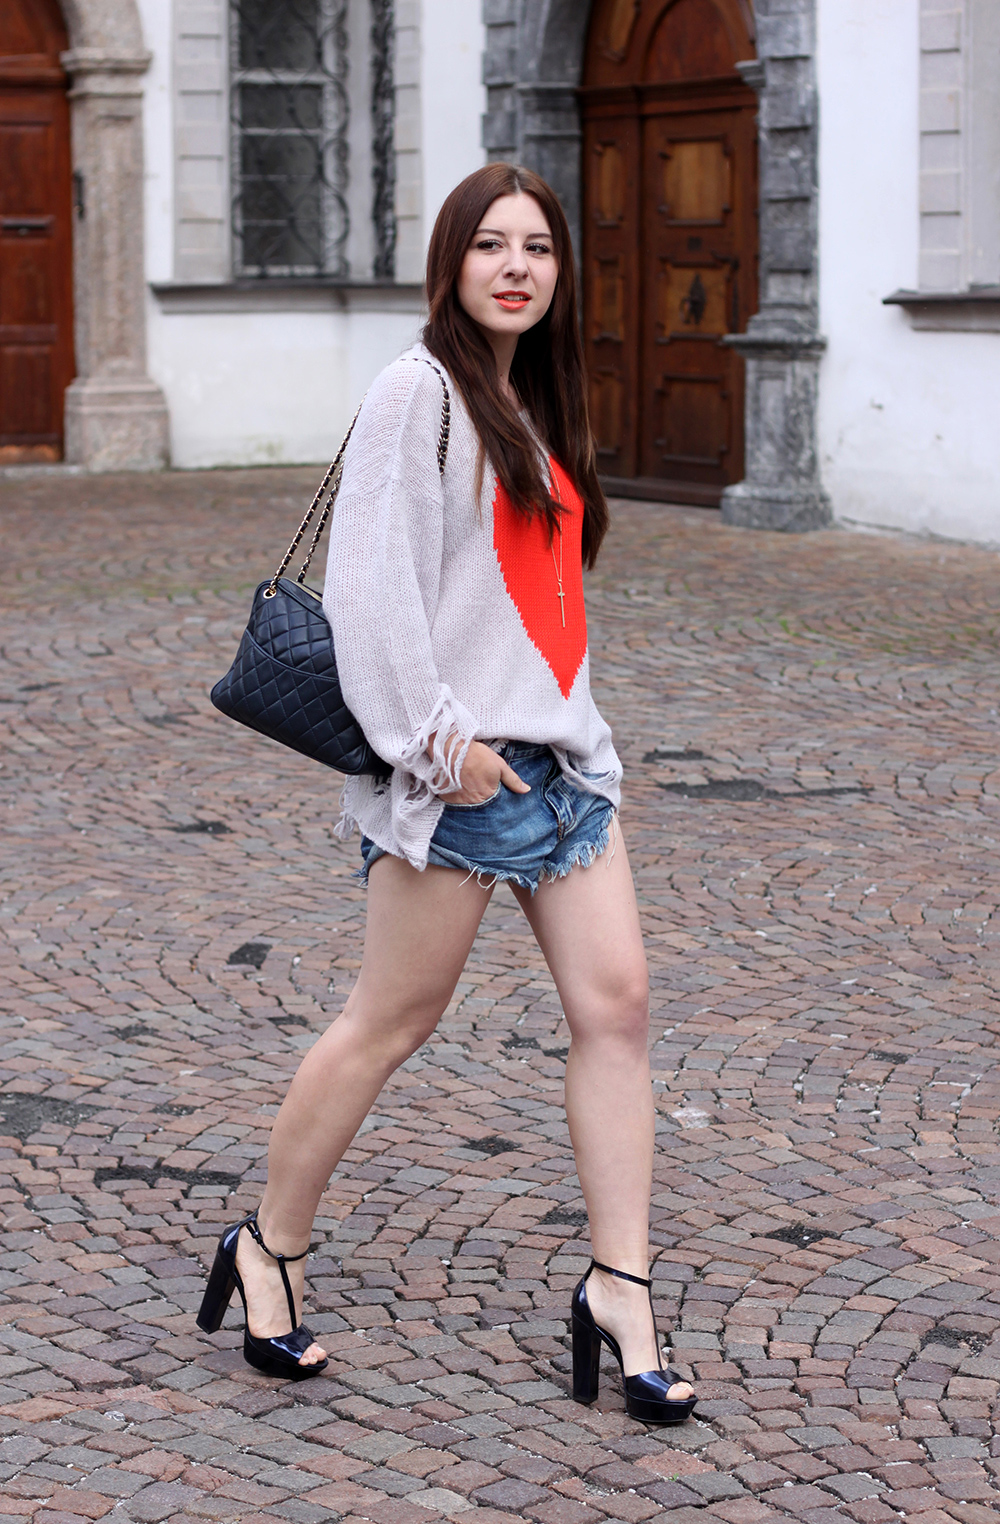 who is mocca, fashionblog tirol, fashionblog österreich, wildfox pullover, wildfox herz pullover, wildfox bianca jagger sweater, grey gardens, one teaspoon shorts, zara high heels, chanel vintage tasche